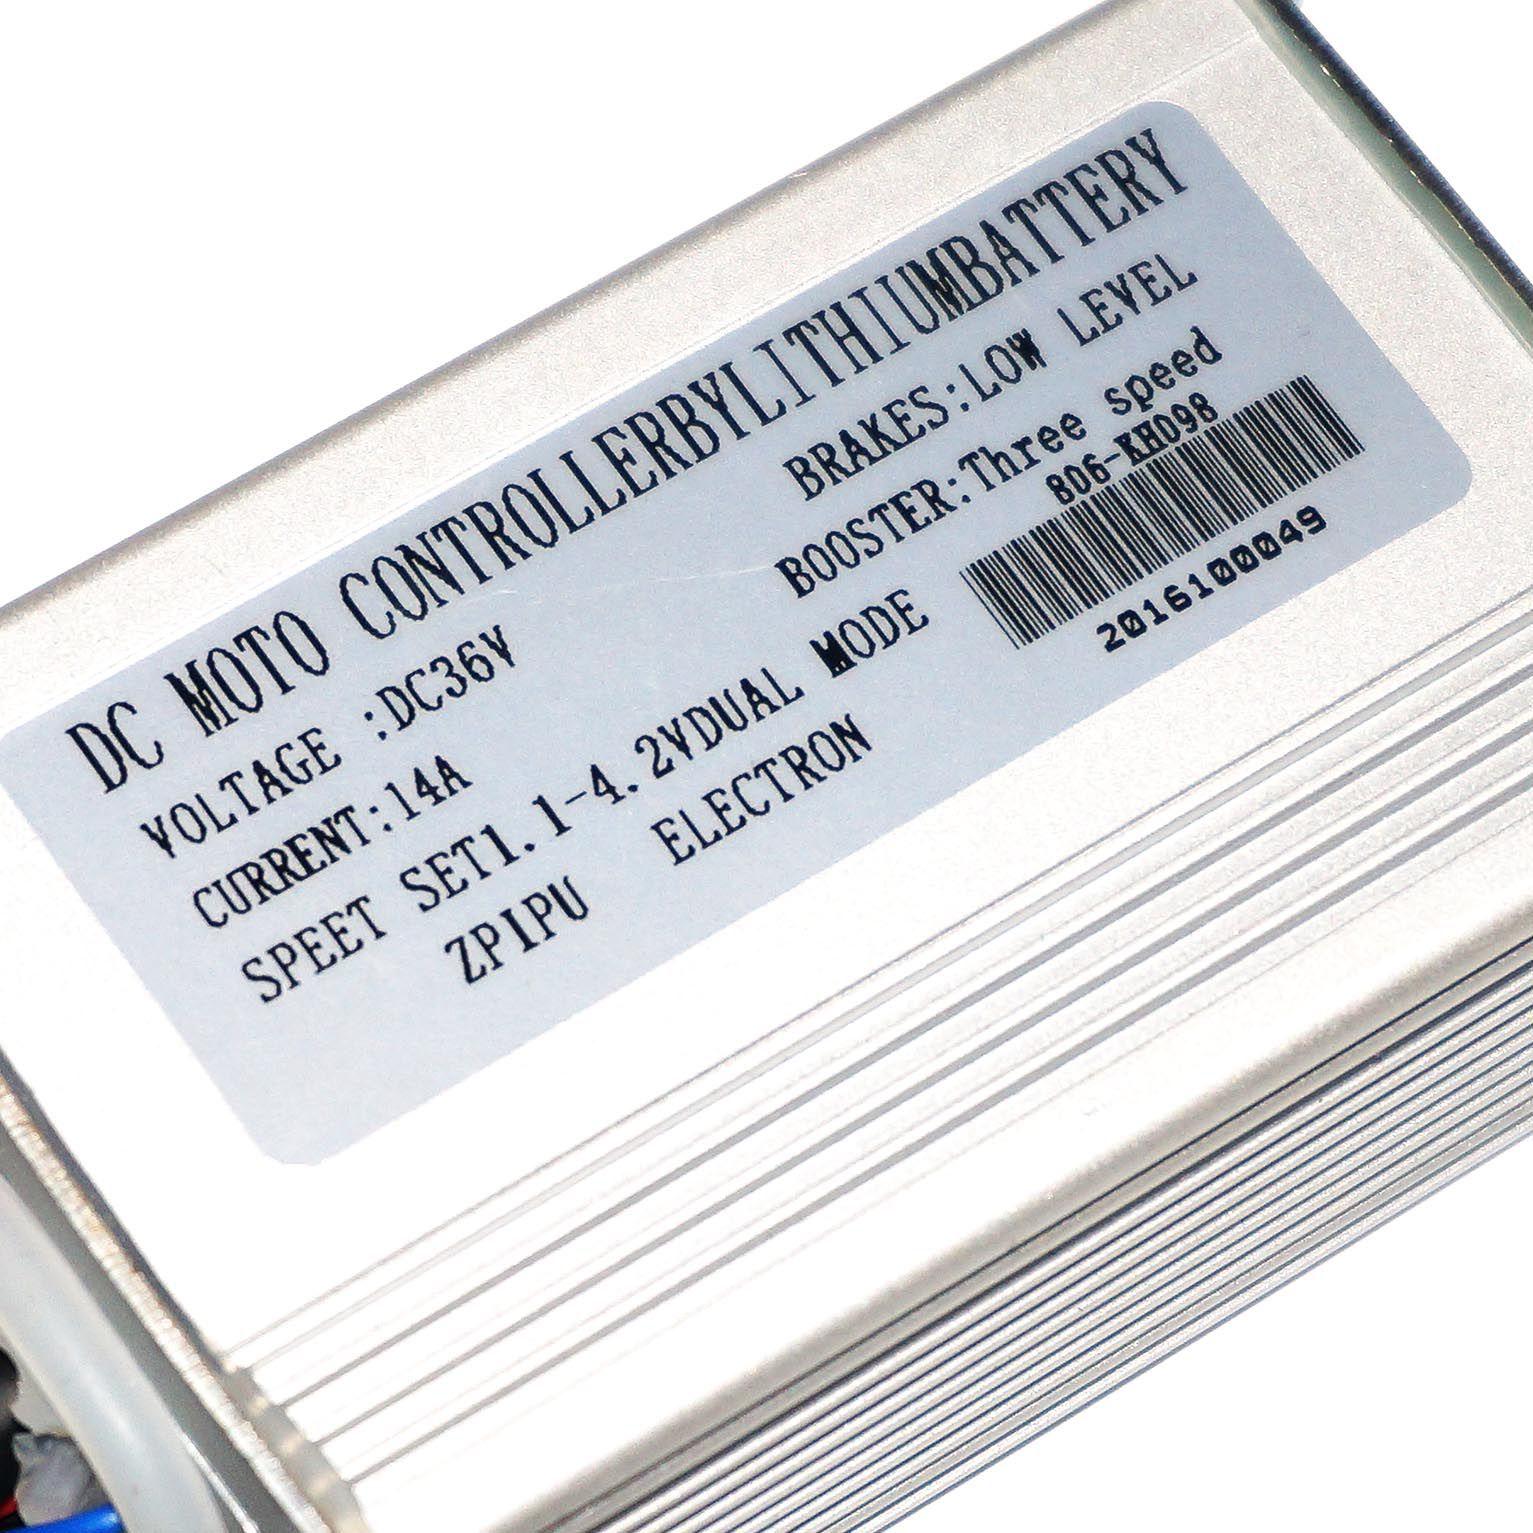 Controladora 36v p/ Painel 810 (Plugada) URBANA/STYLE/CLASSIC/JS 20 2017/2018/2019/2020